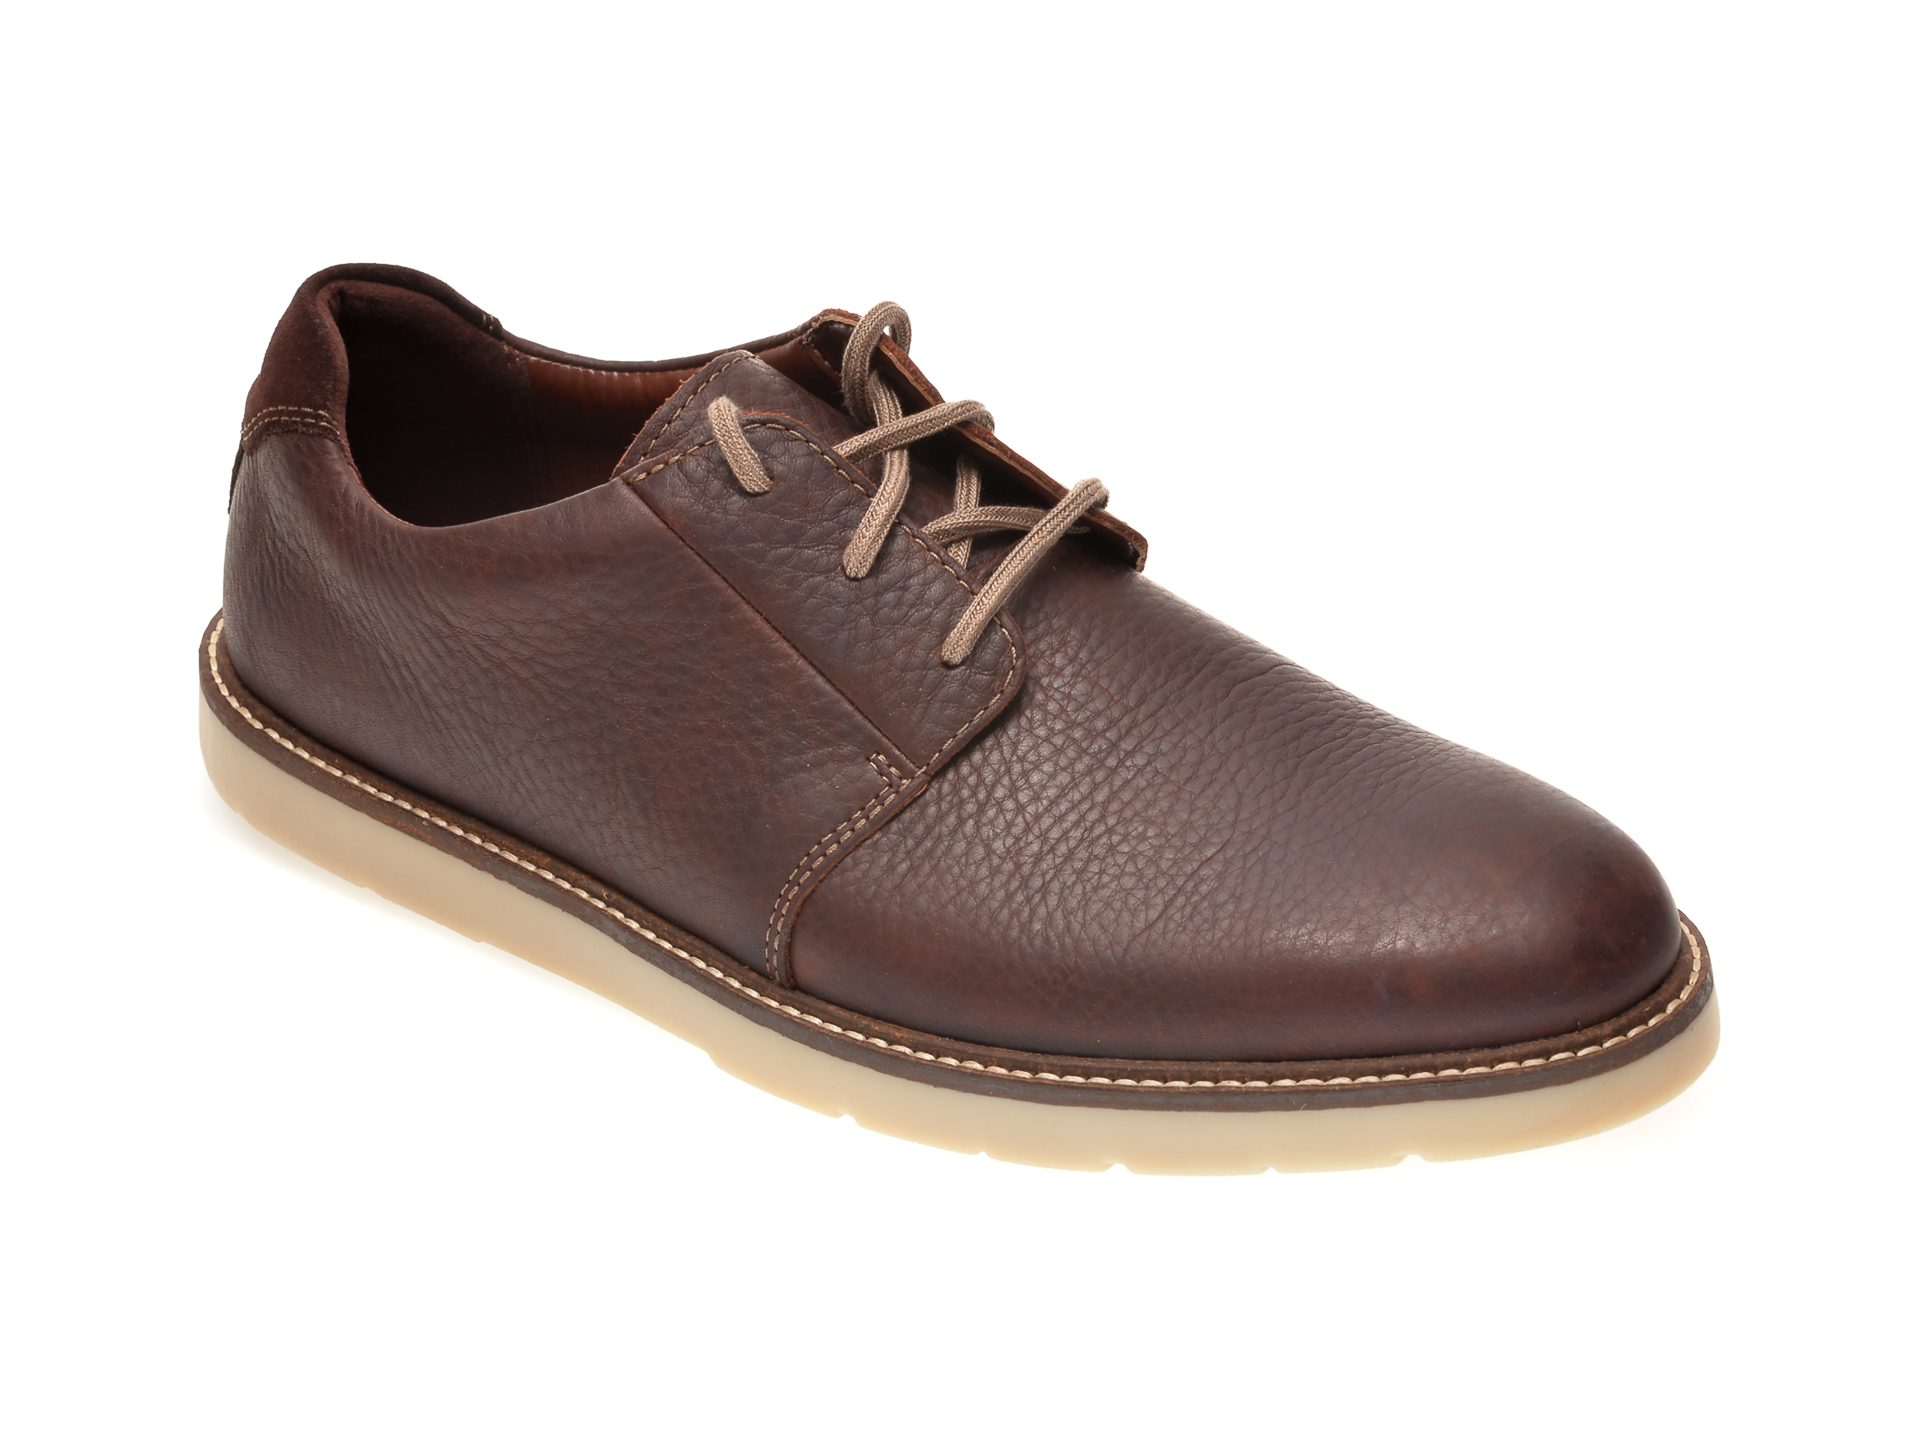 Pantofi CLARKS maro, GRANDIN PLAIN, din piele naturala imagine